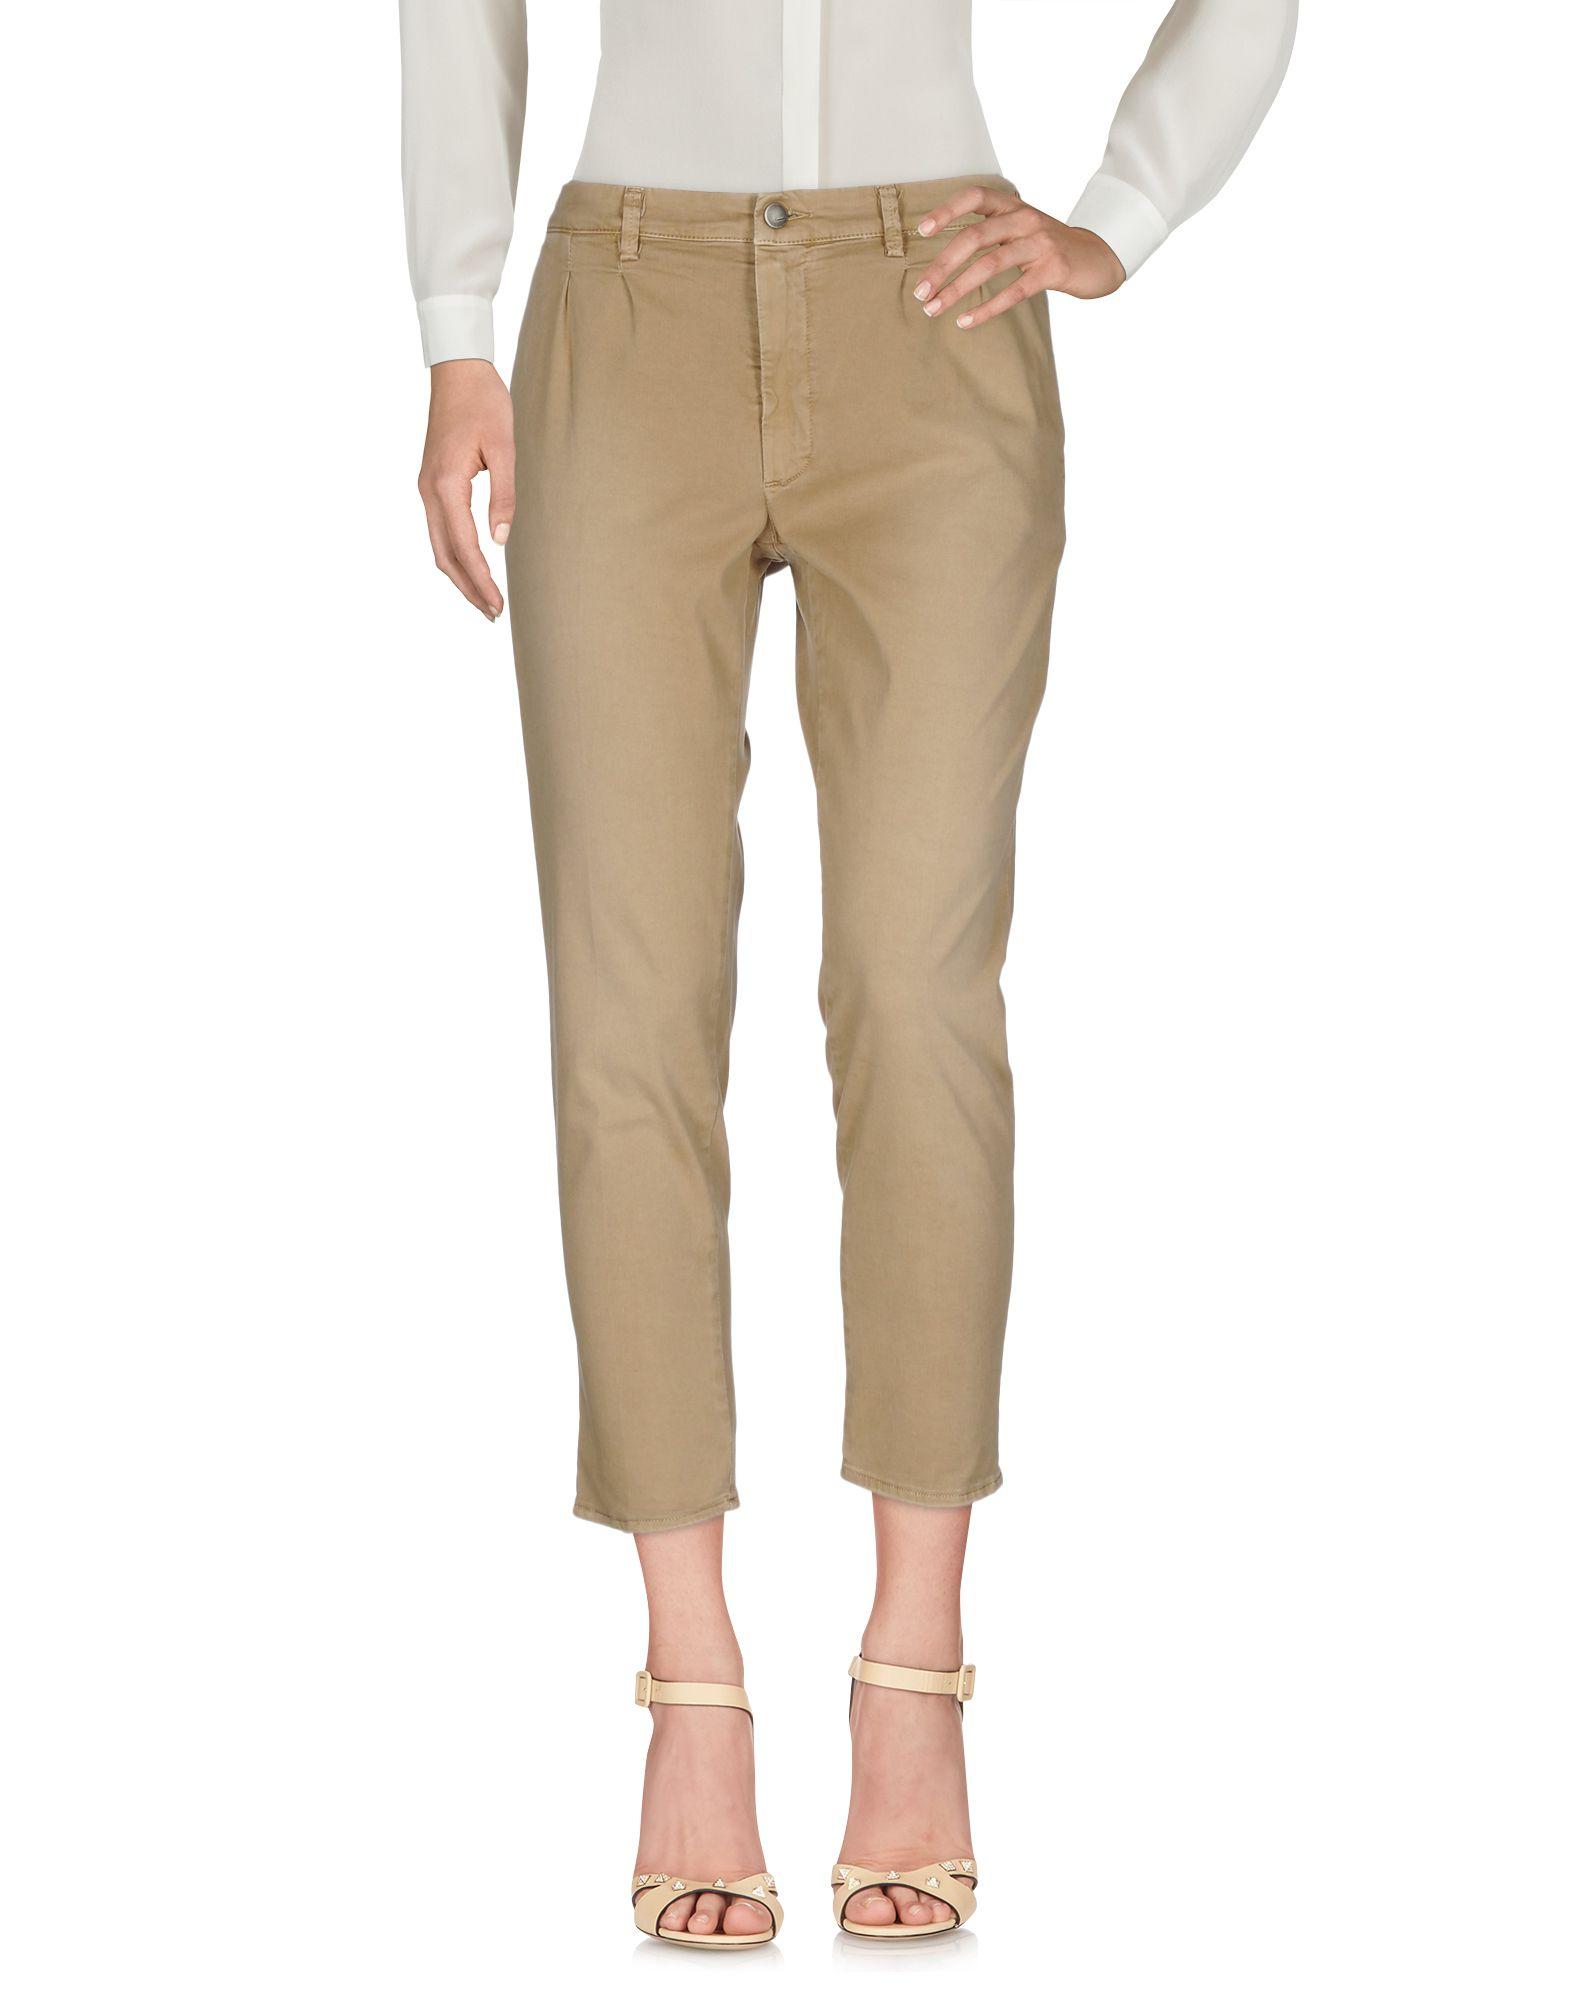 Pantalone (+) People Donna - Acquista online su